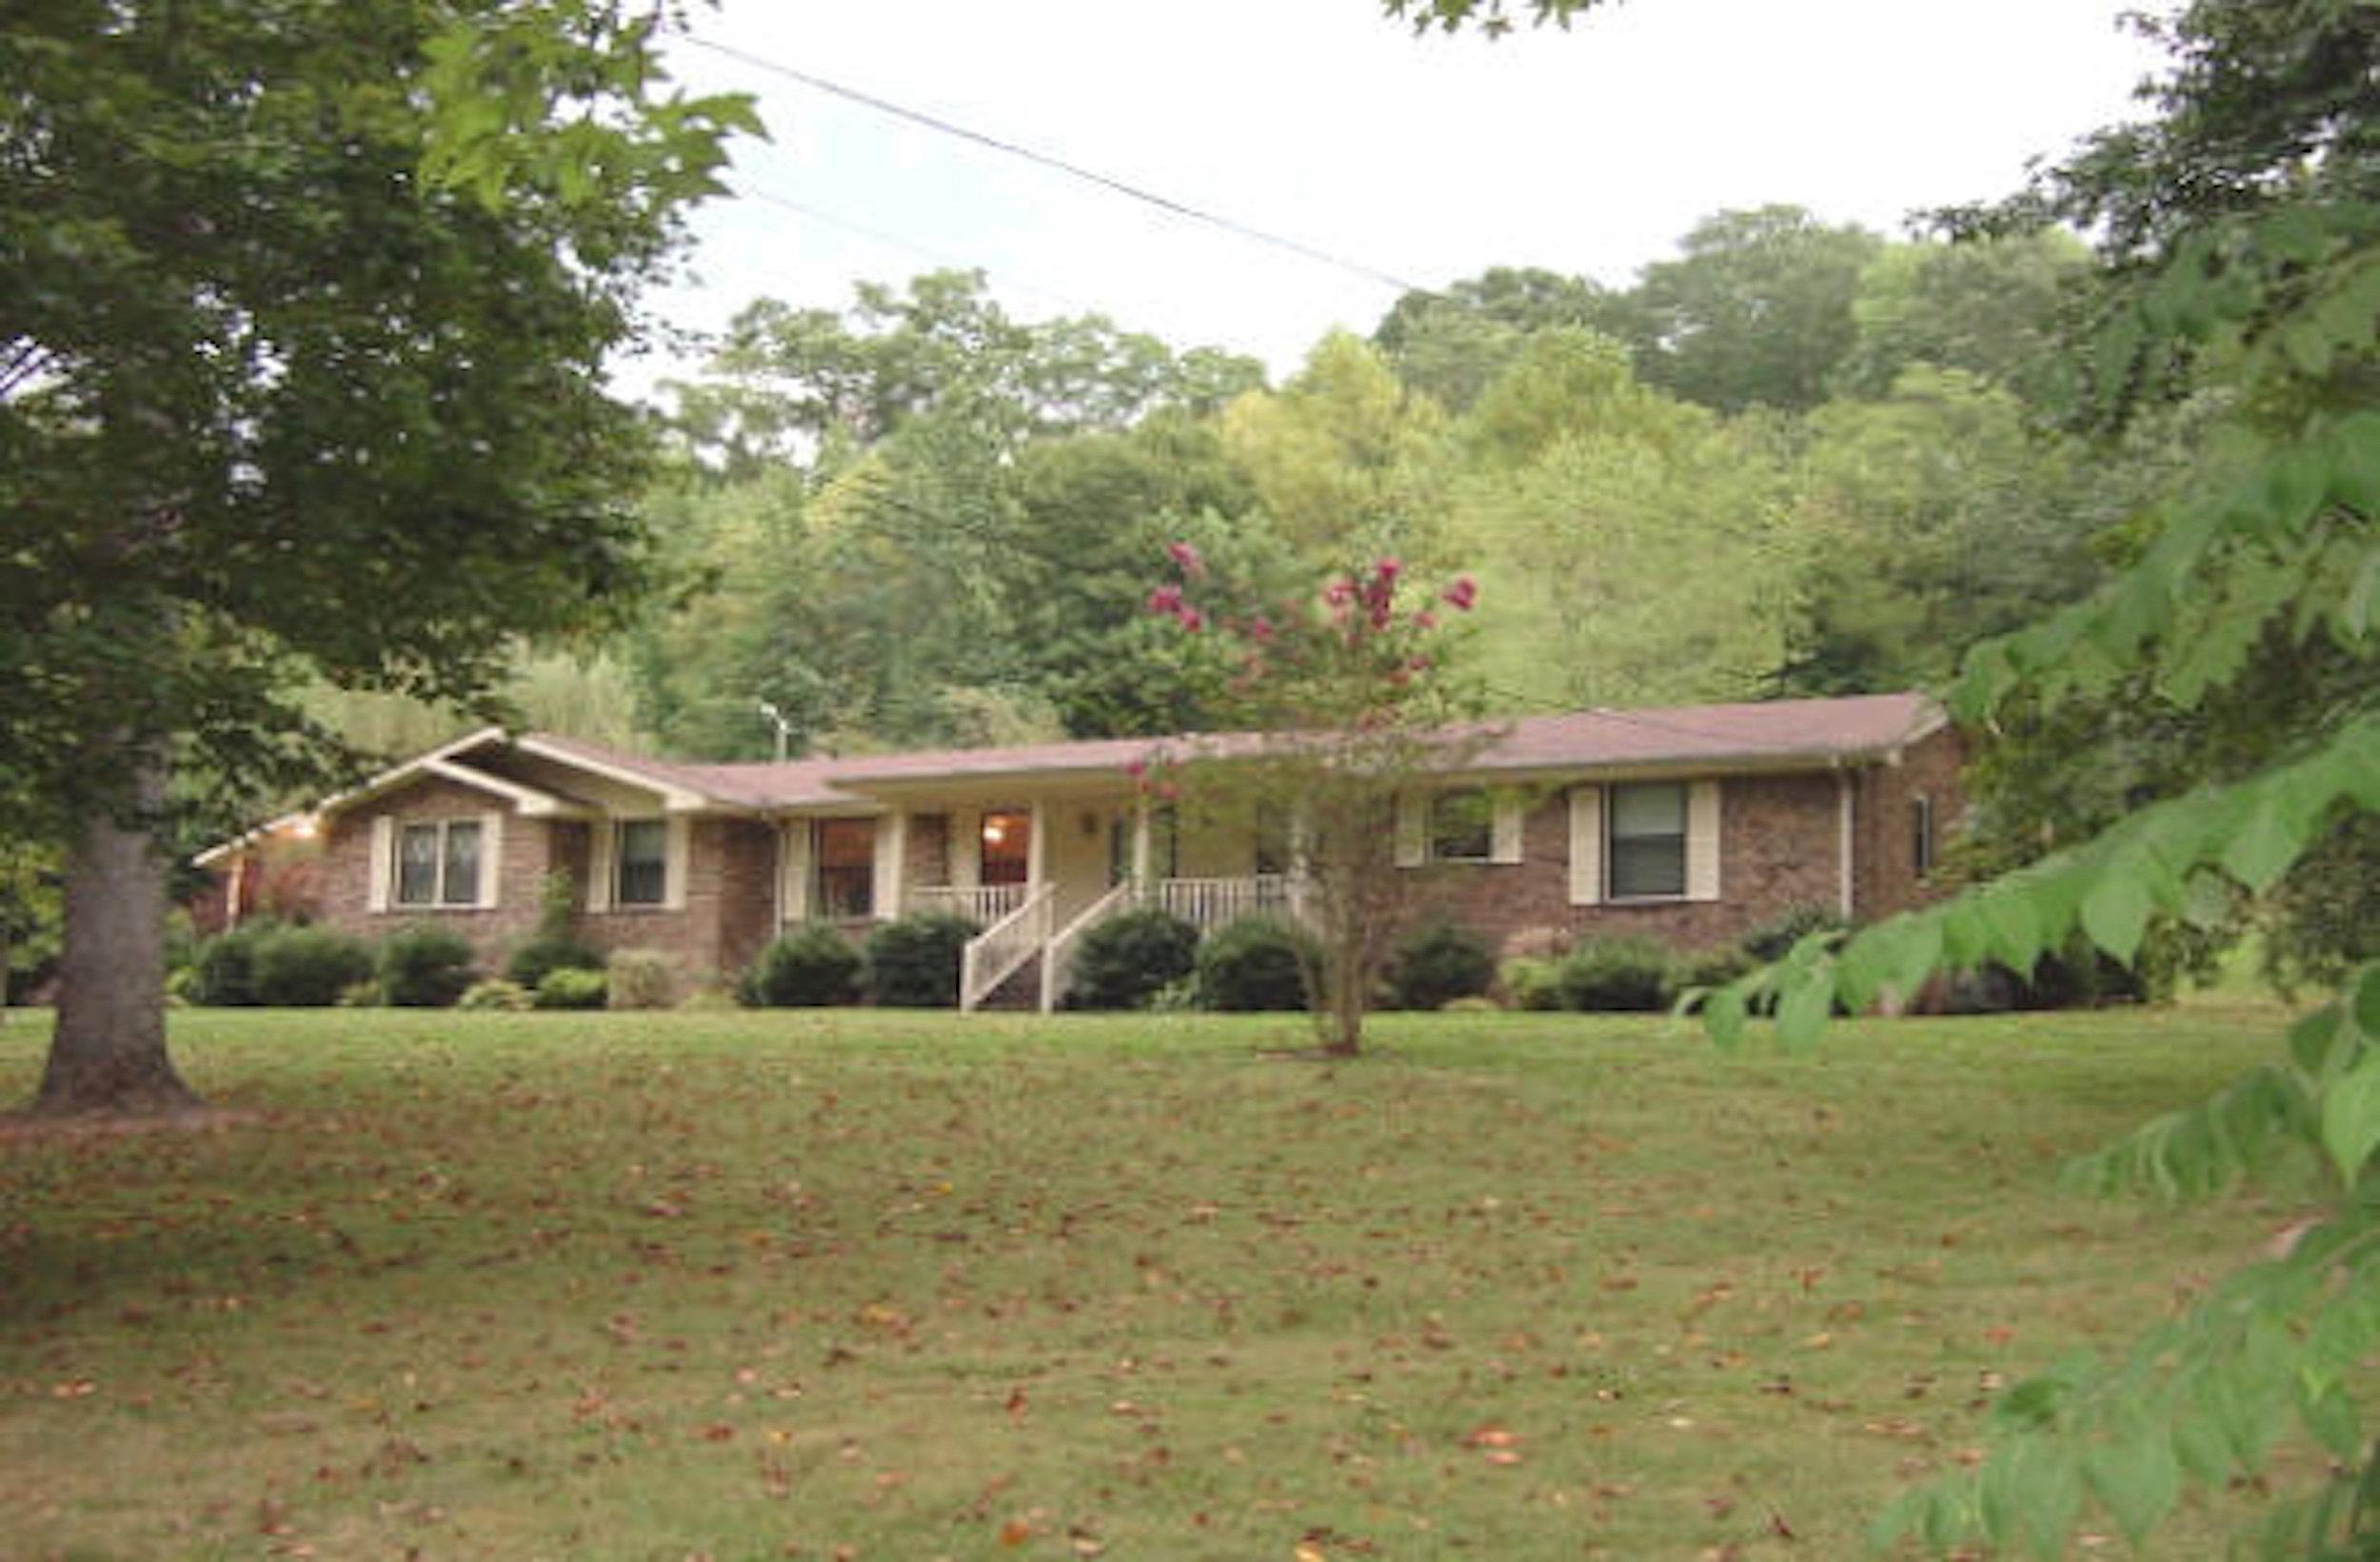 376 Hogans Brach Rd AVAILABLE NOW   GOODLETTSVILLE: Single Family Home  3 Br 2 Ba + 2 Car heated garage +Fireplace + Deck + 11 Acres